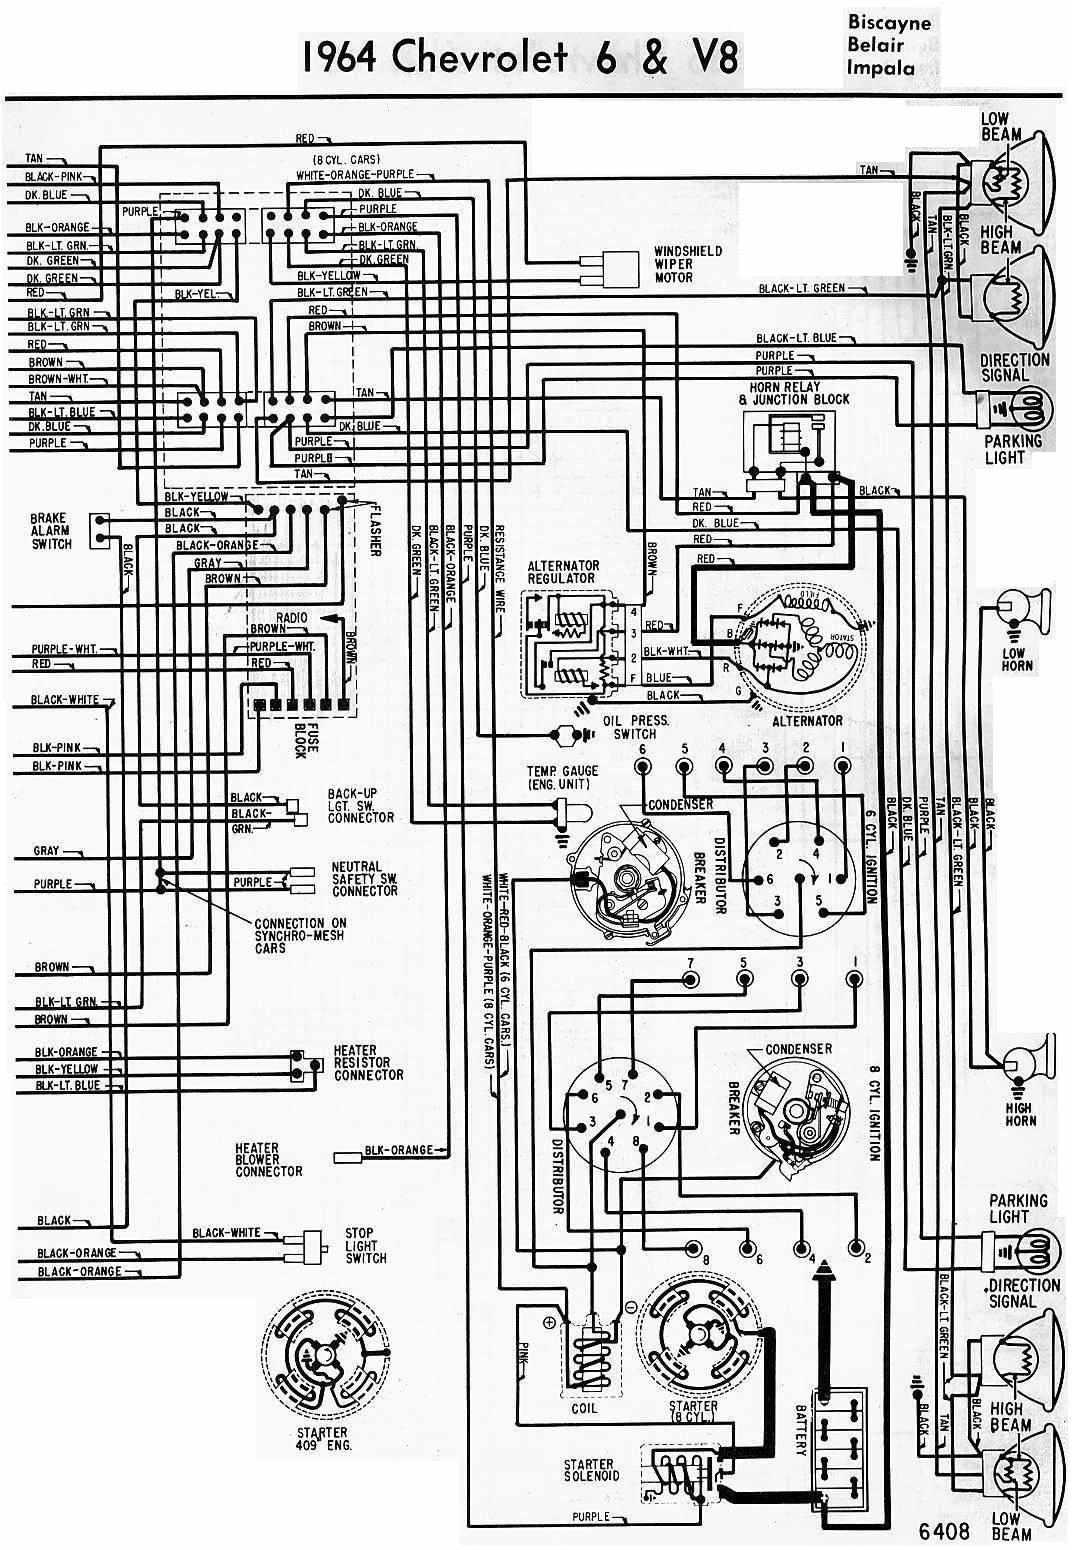 ignition switch wiring diagram chevy impala 65 impala ignition wiring diagram wiring diagram data  65 impala ignition wiring diagram